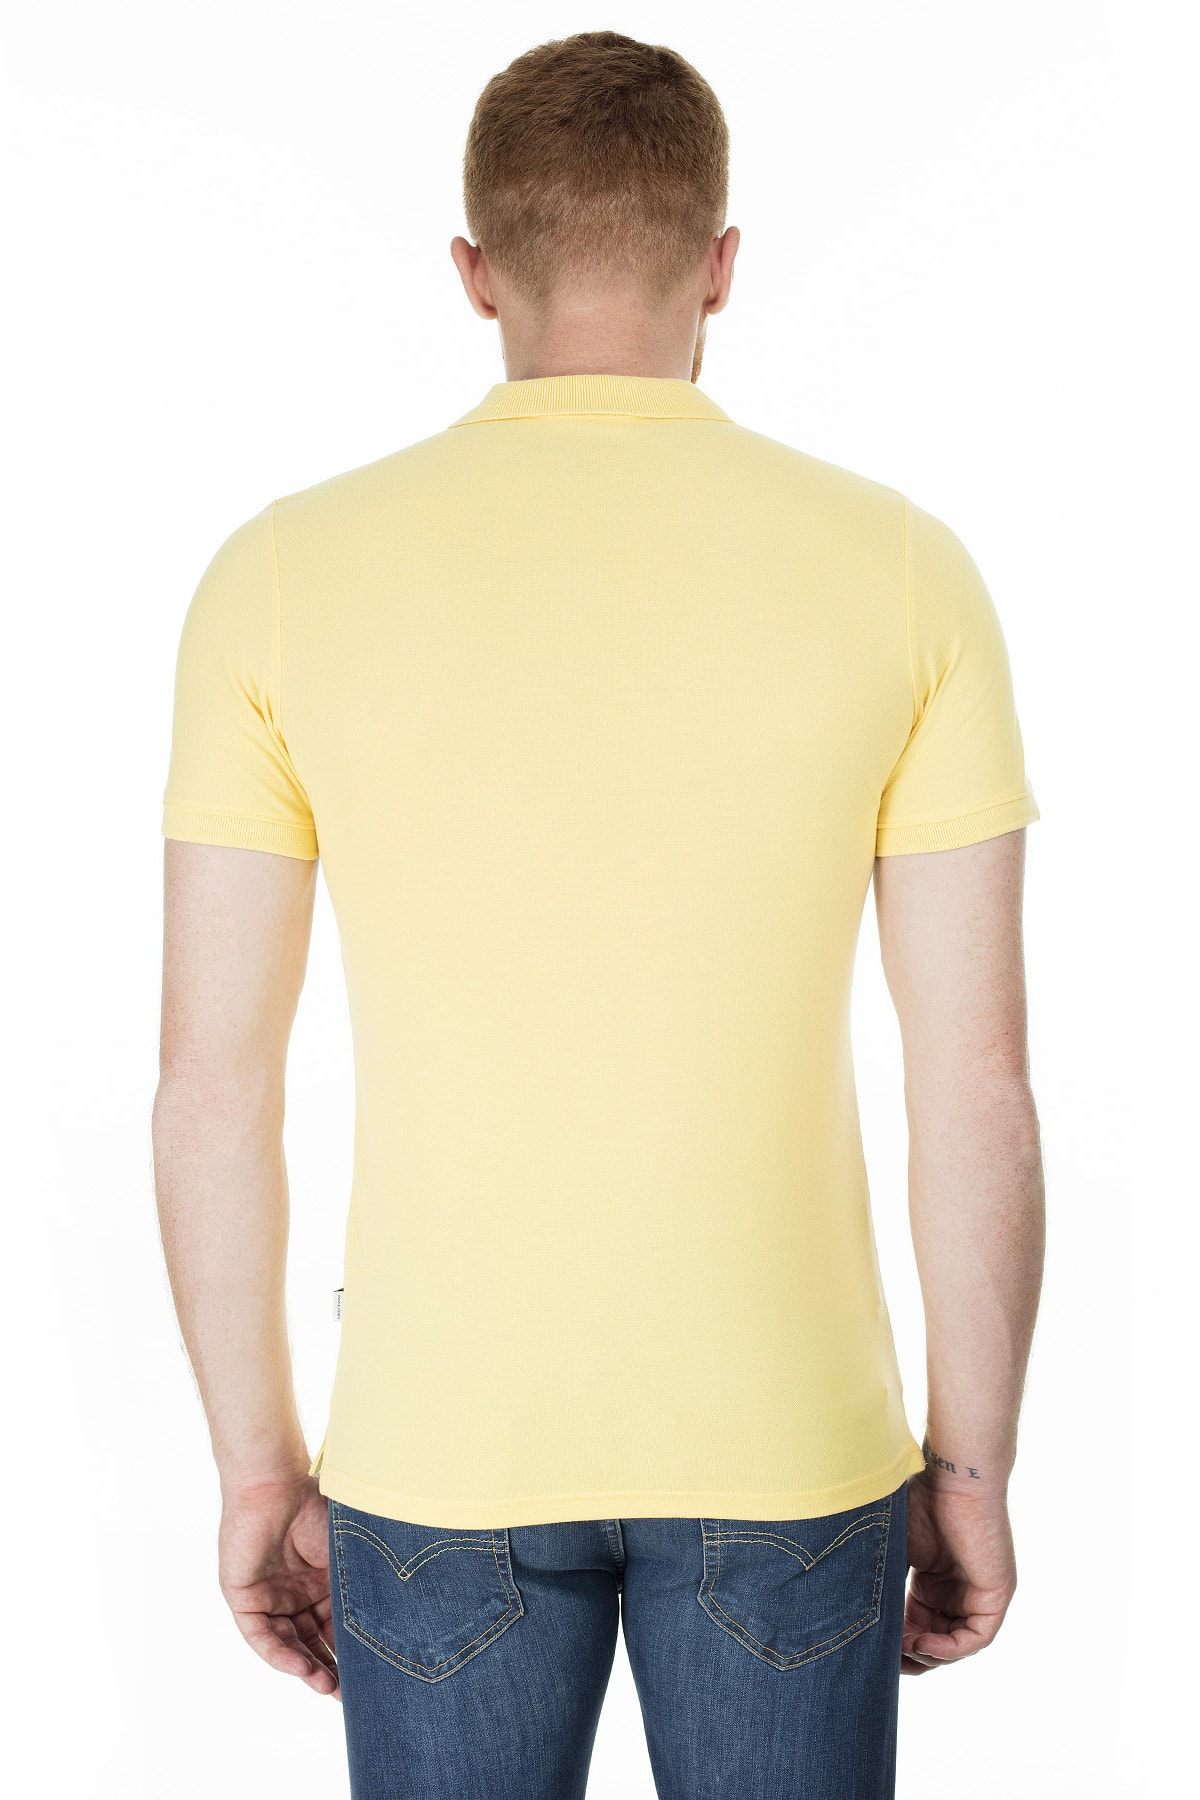 Jack & Jones Slim Fit Essentials Jjebasıc Polo T Shirt ERKEK POLO 121365162 2